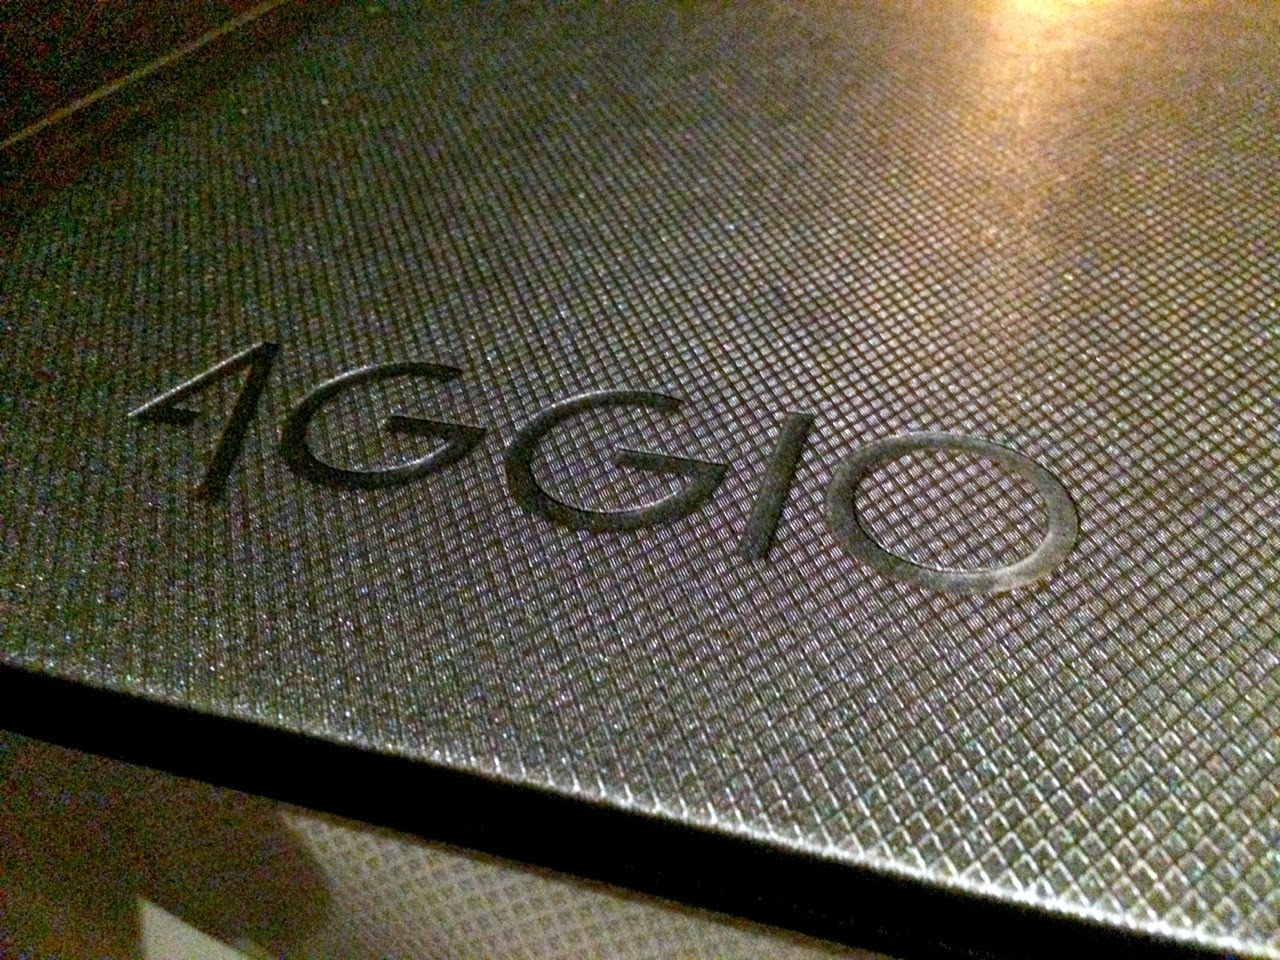 Aggio restaurant review